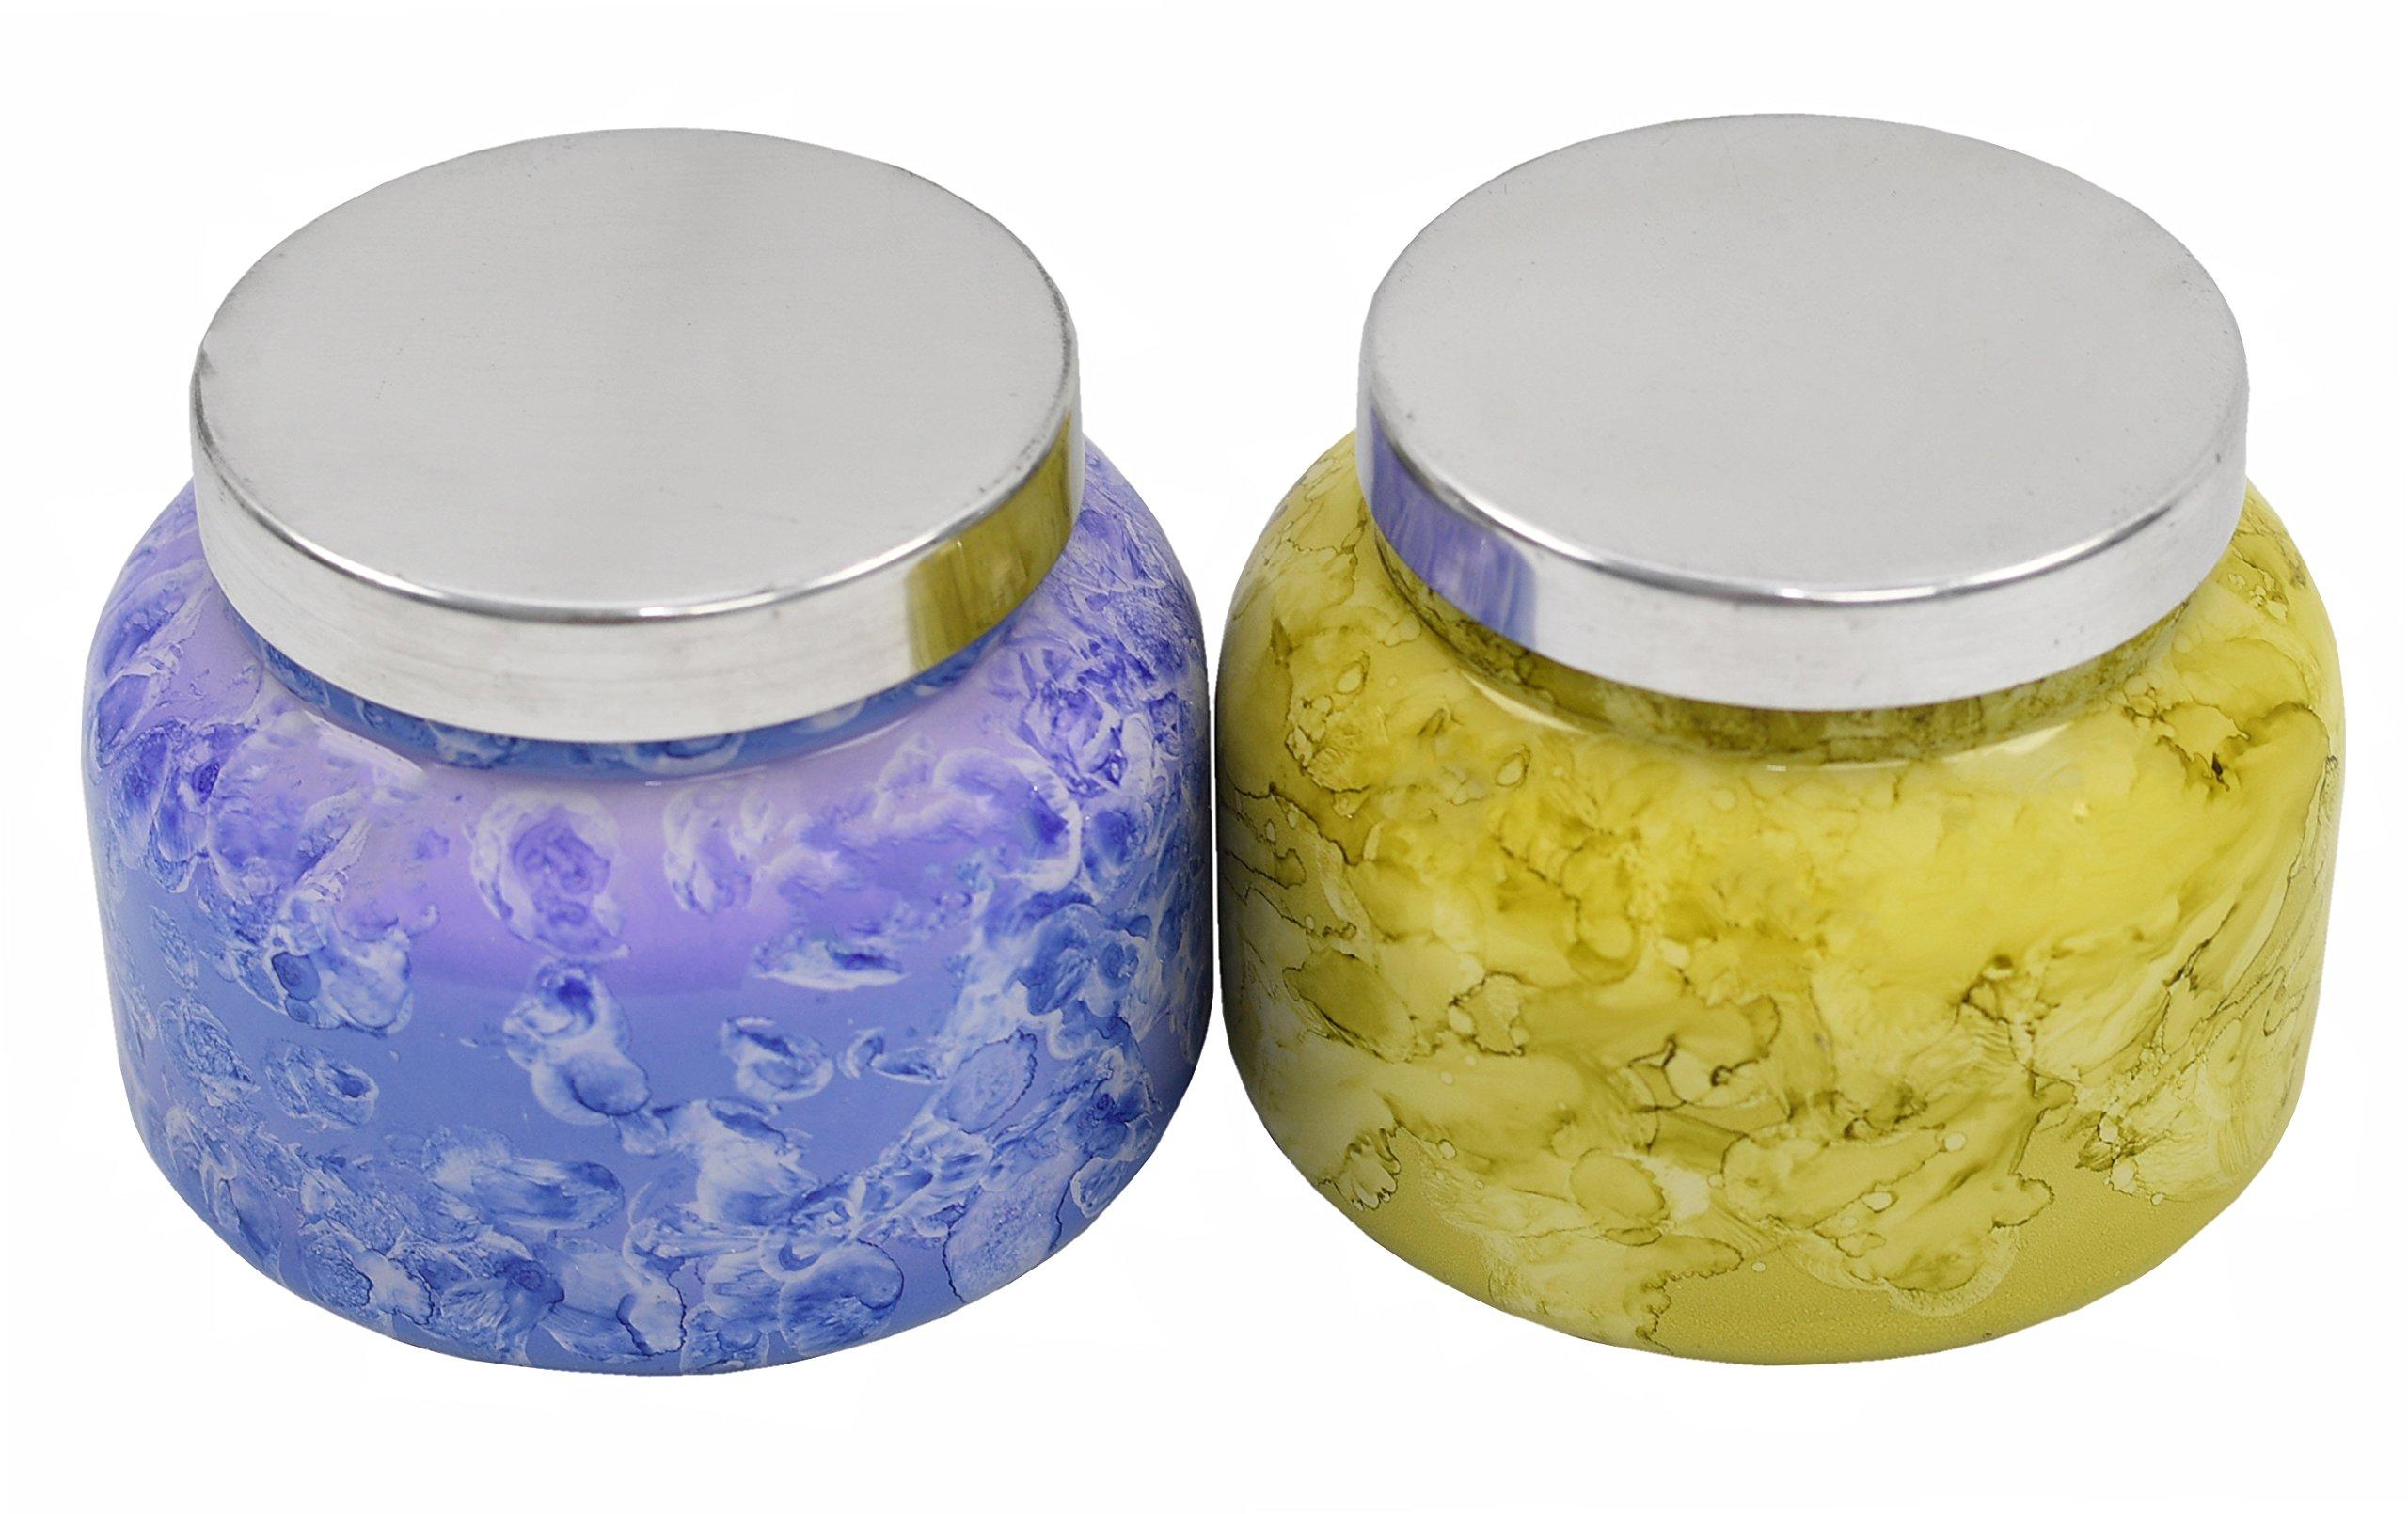 Capri Blue 19 oz. Aloha Orchid & Blue Jean Watercolor Collection Jar Candle.